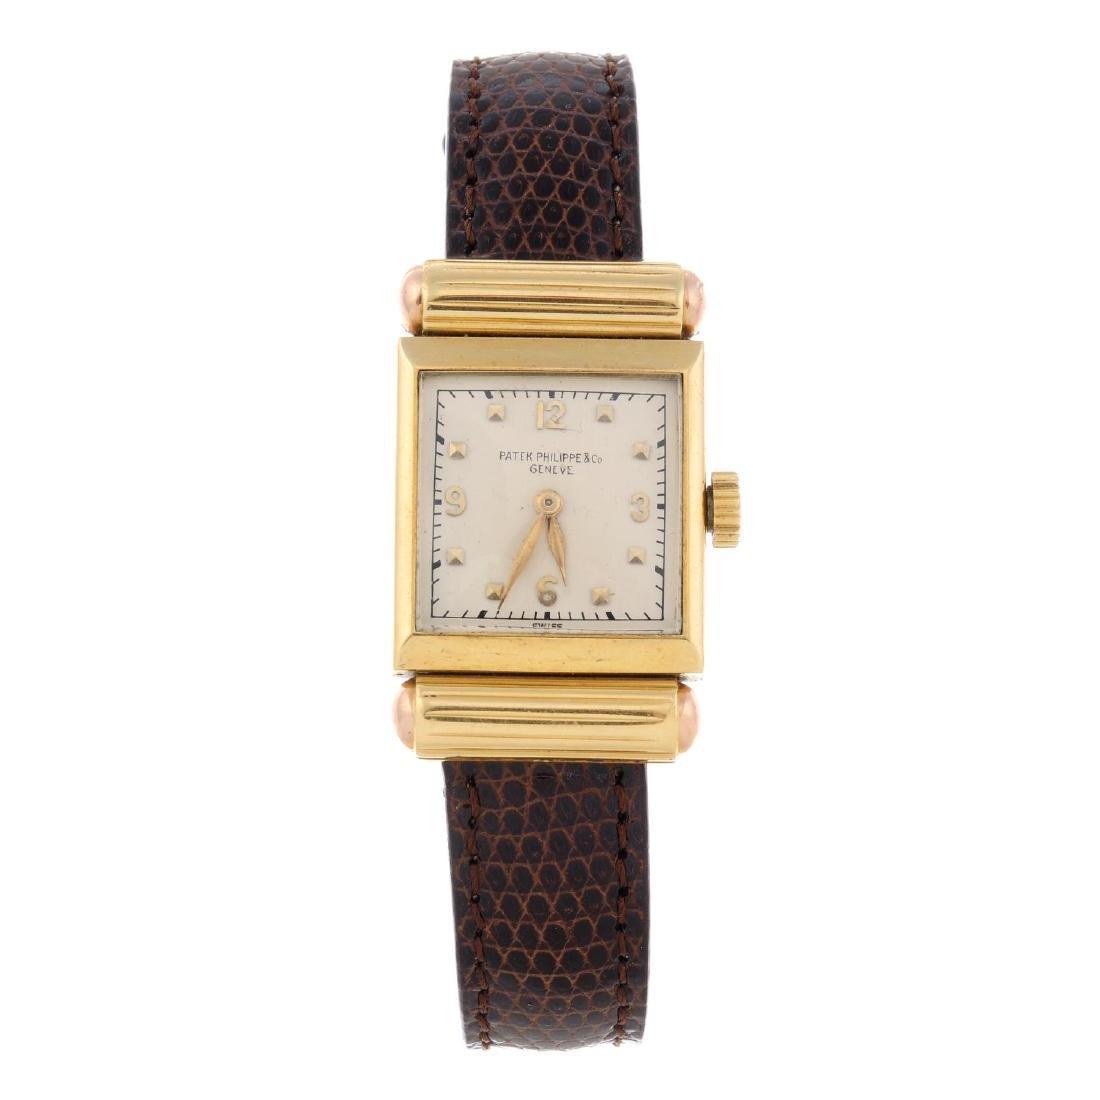 PATEK PHILIPPE - a lady's wrist watch. Yellow metal